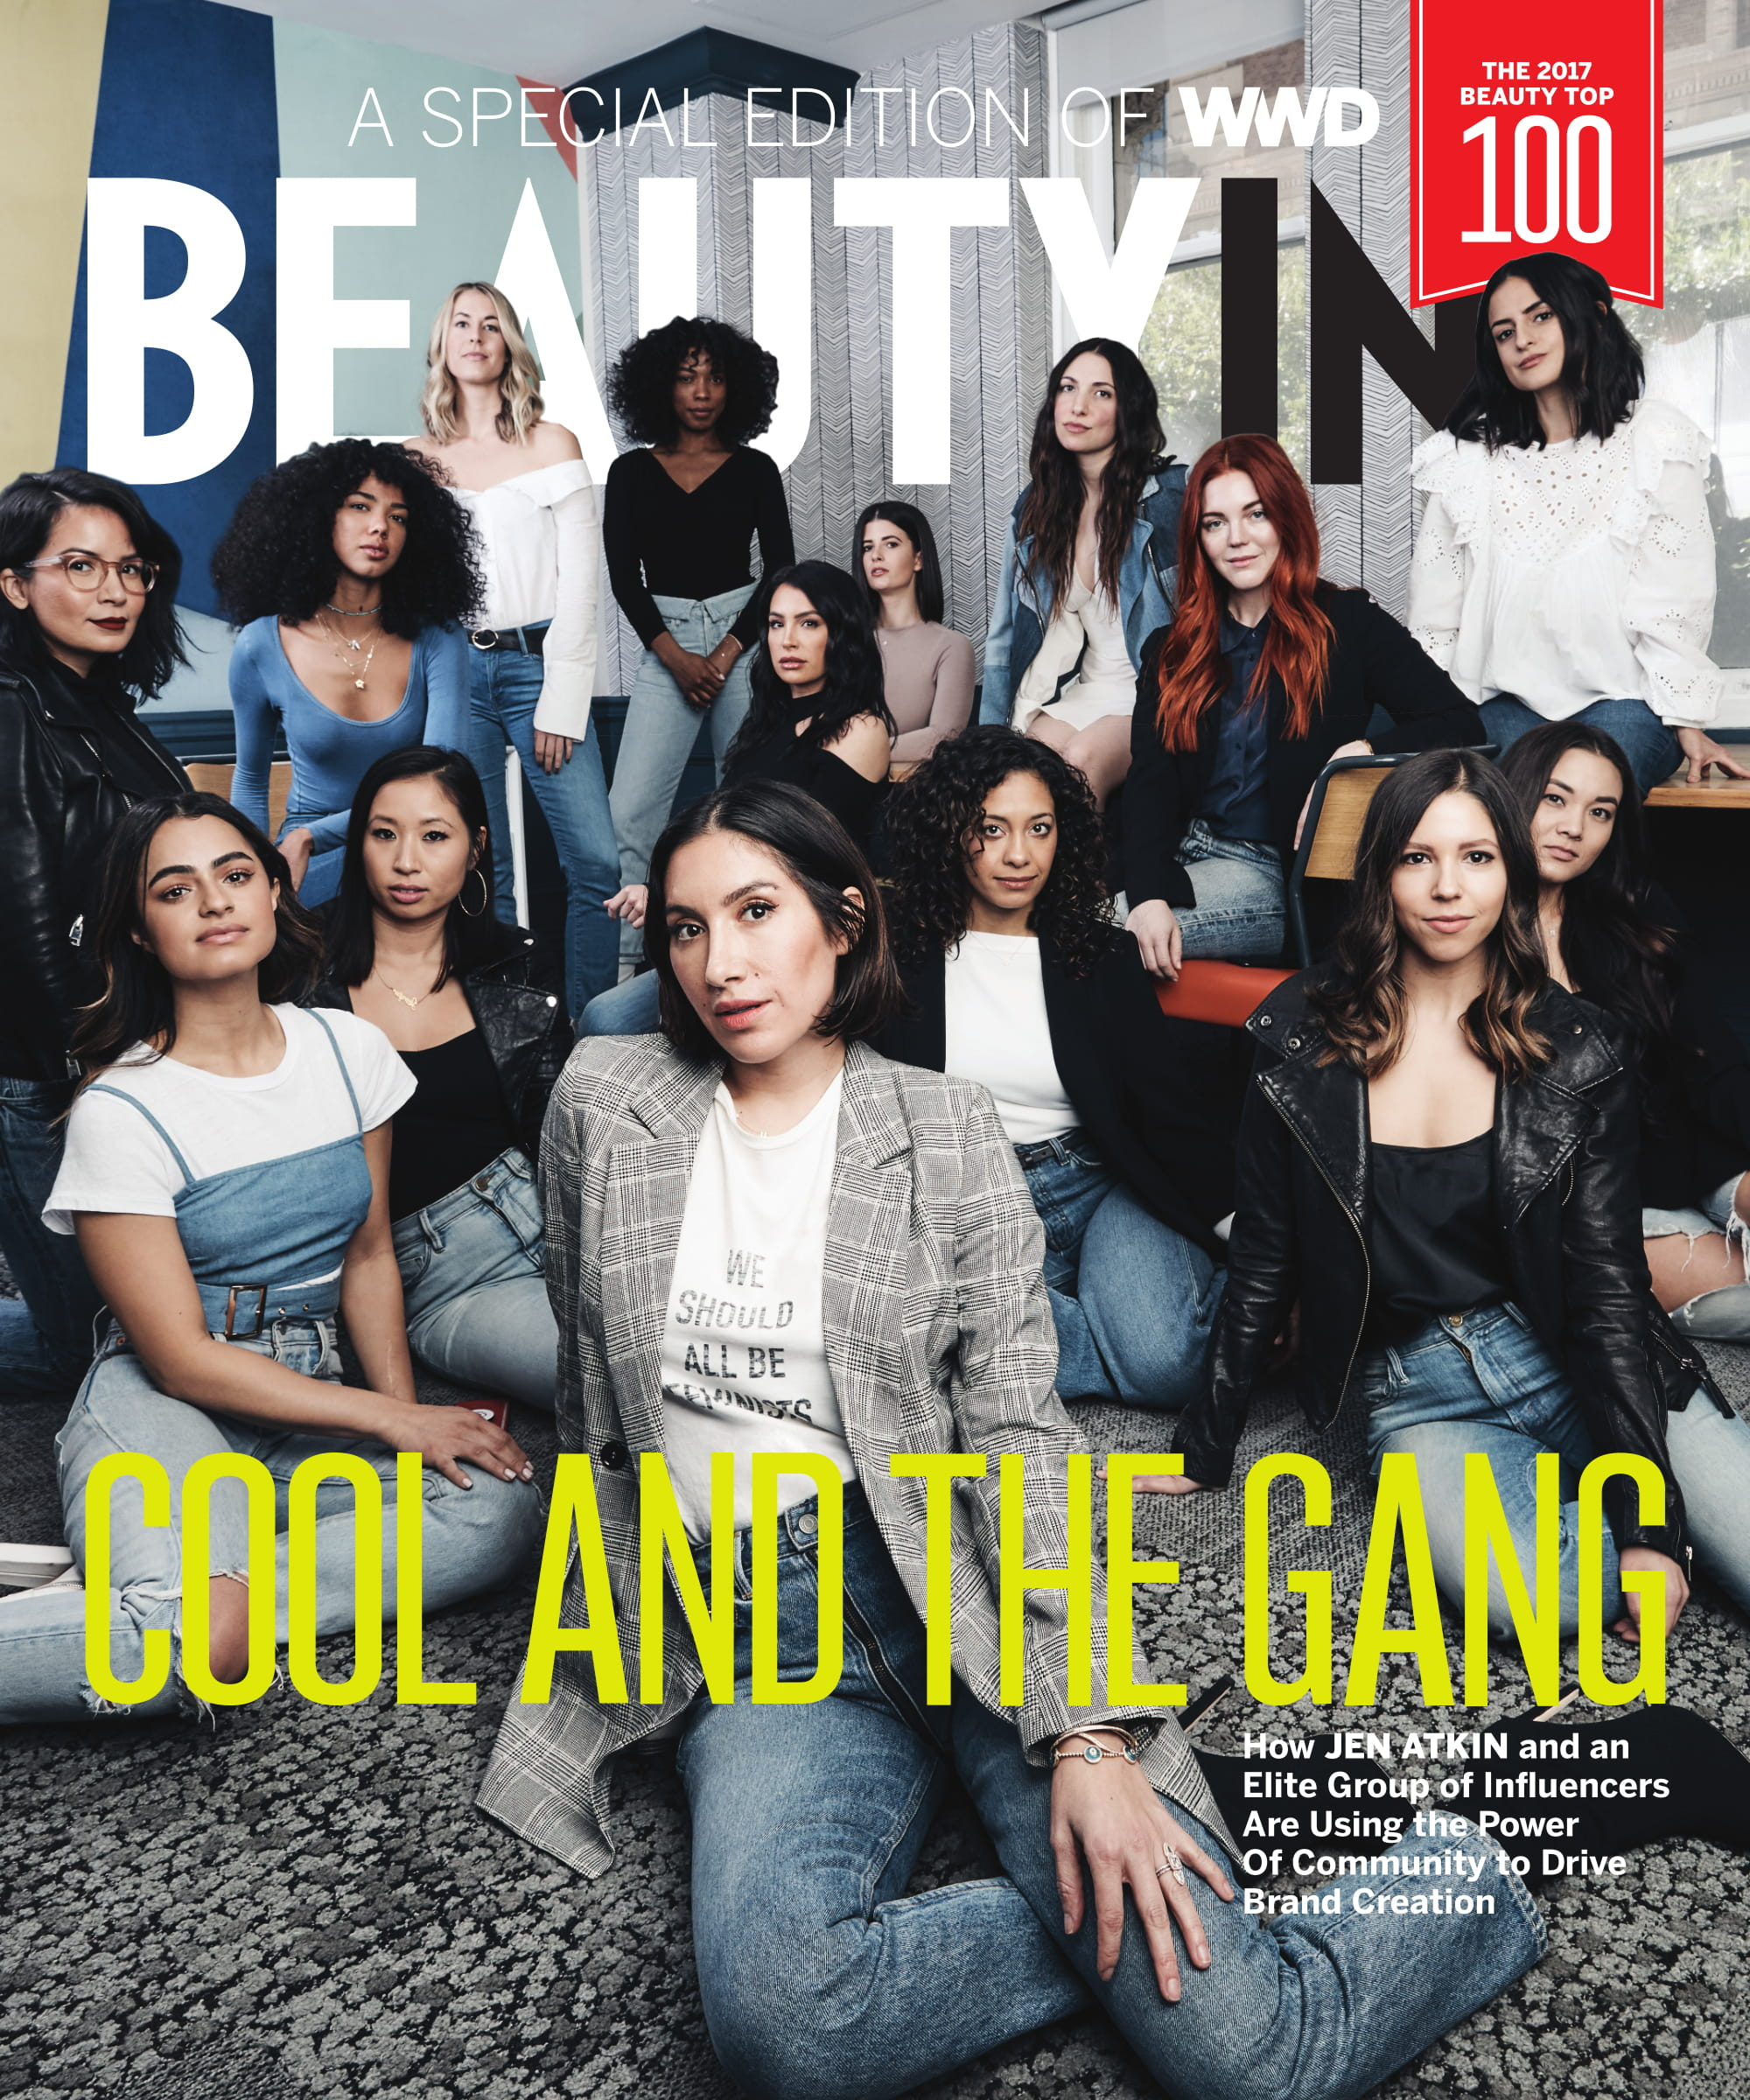 BEAUTYINC+APRIL+COVER-1.jpg